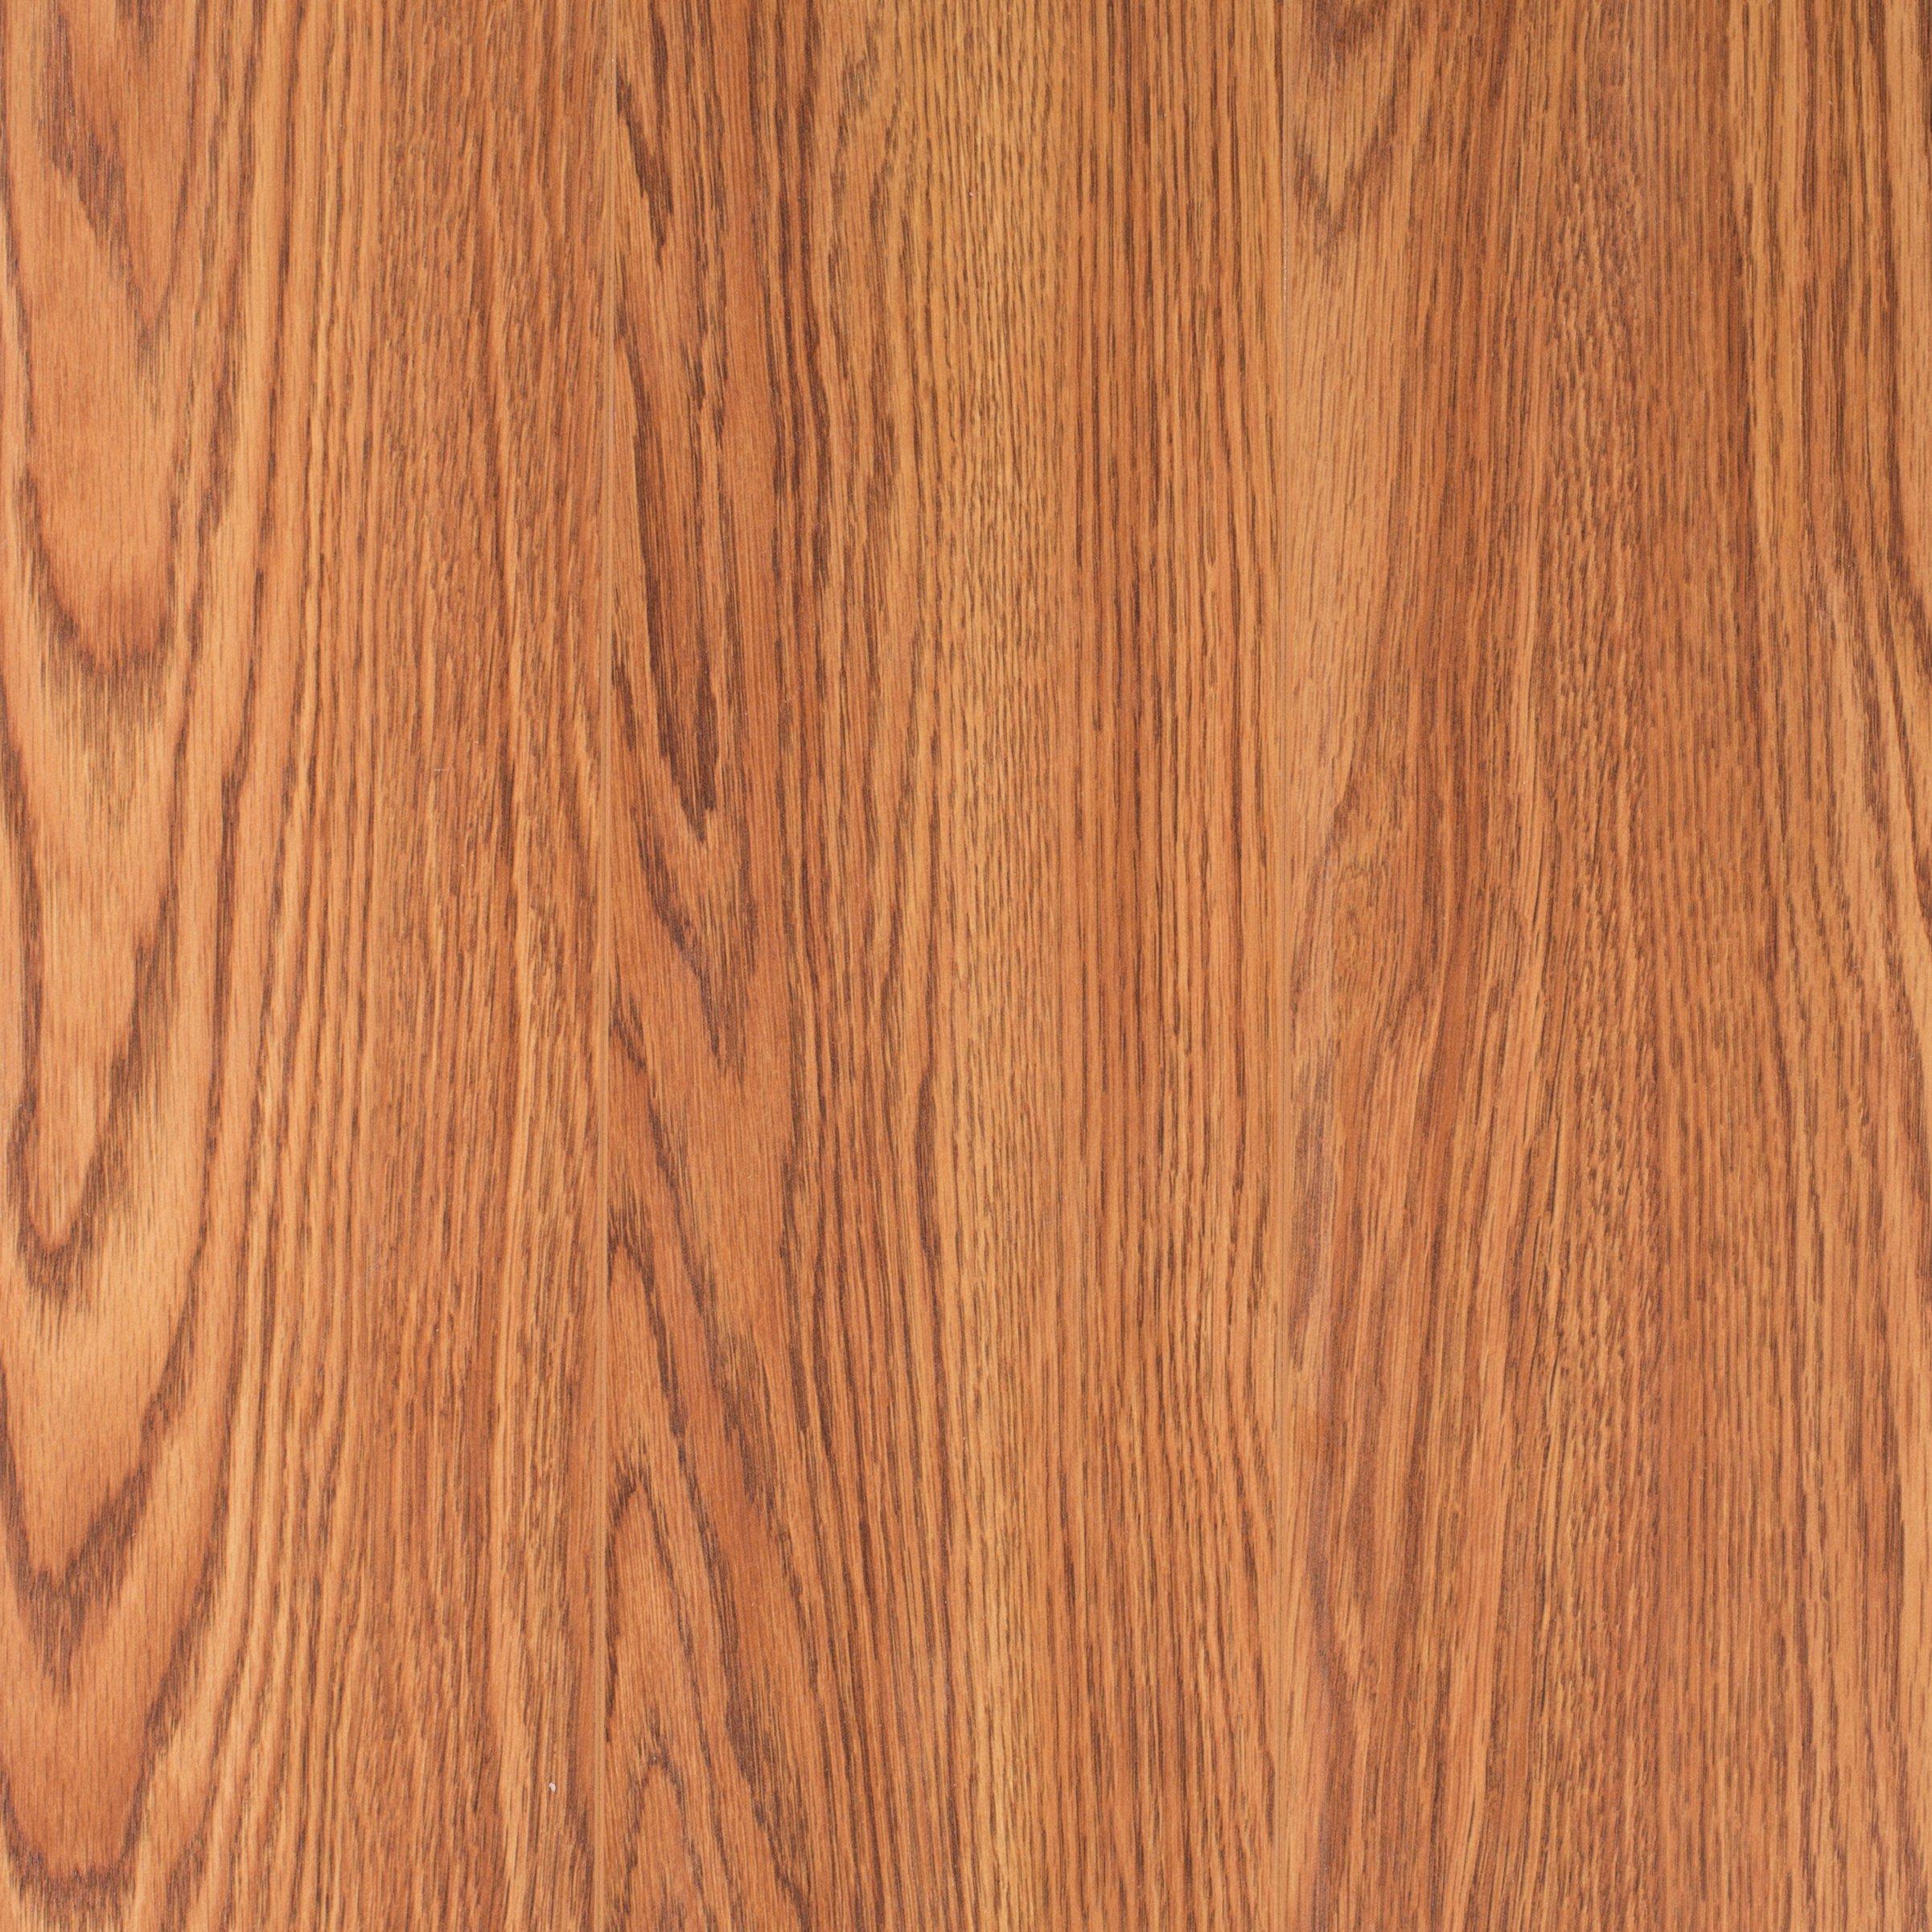 Bellawood Brazilian Koa Flooring Reviews Elegant Home